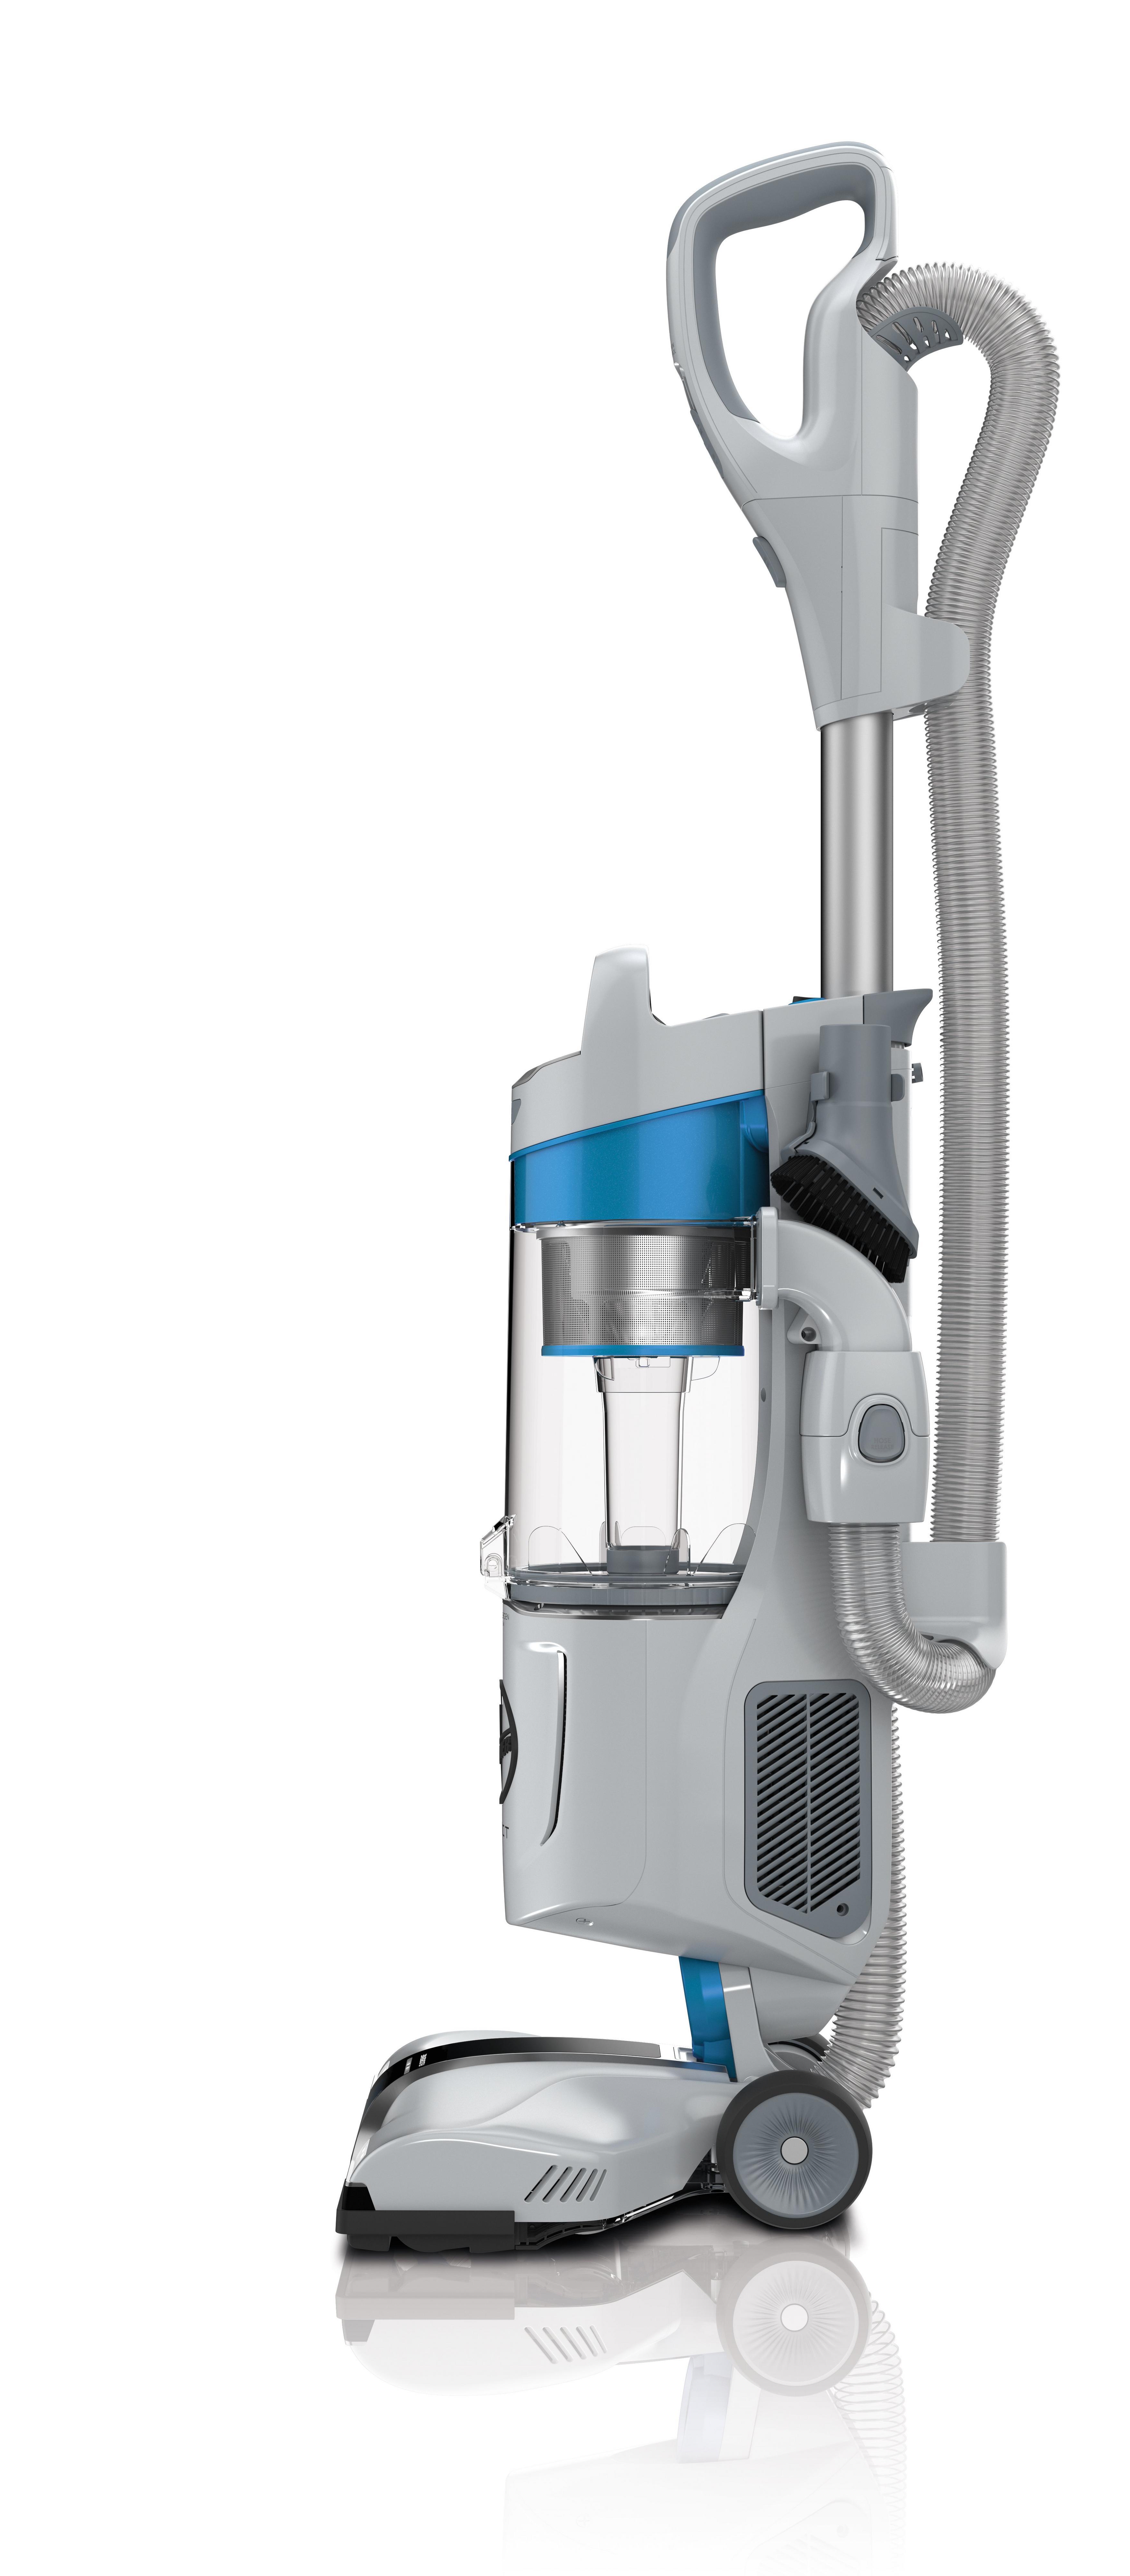 REACT Upright Vacuum12